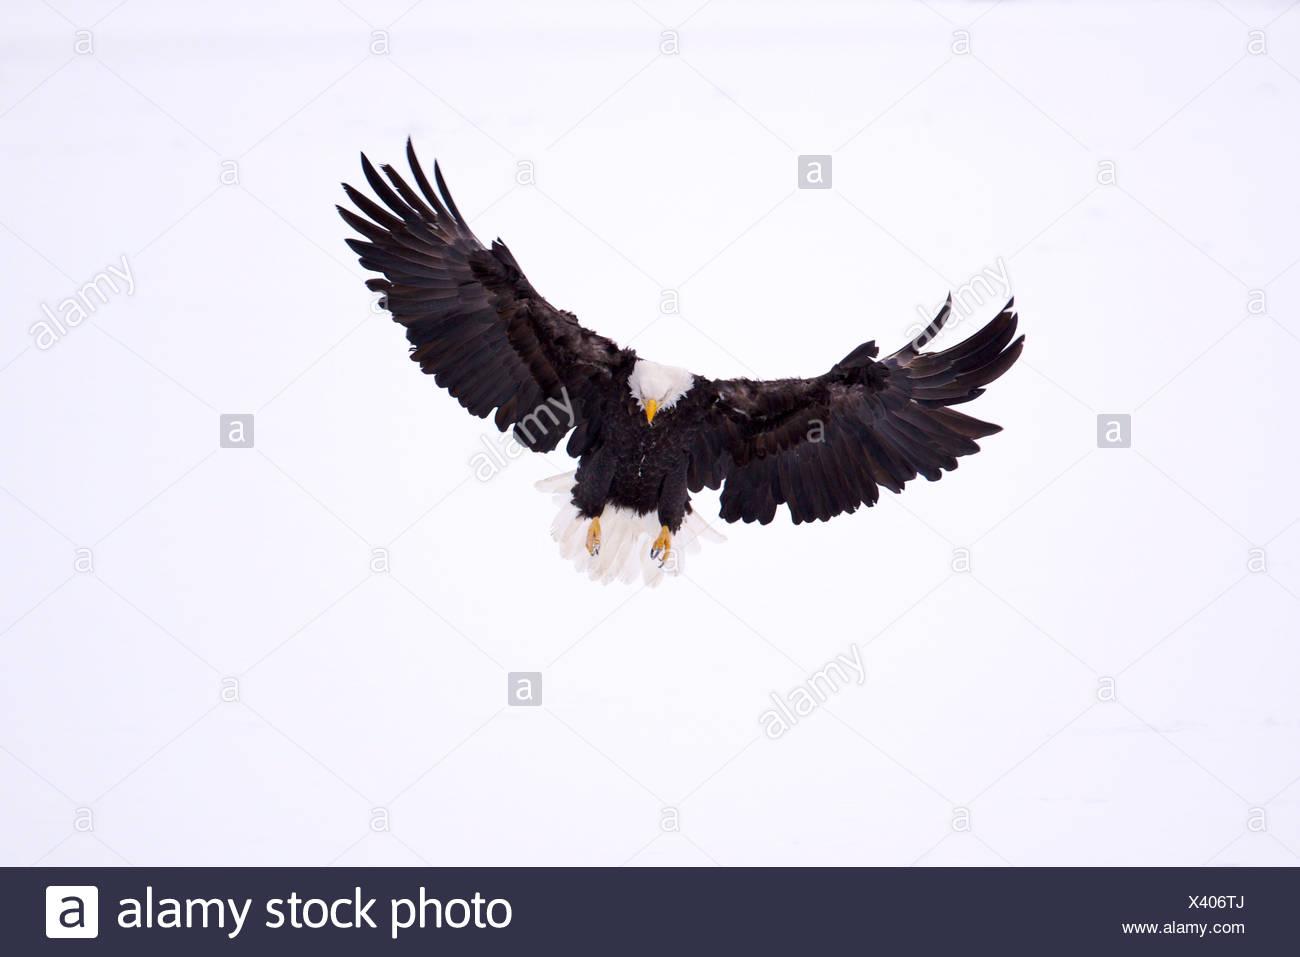 USA, Alaska Chilkat Bald Eagle zu bewahren, Weißkopf-Seeadler (Haliaeetus Leucocephalus) Stockbild